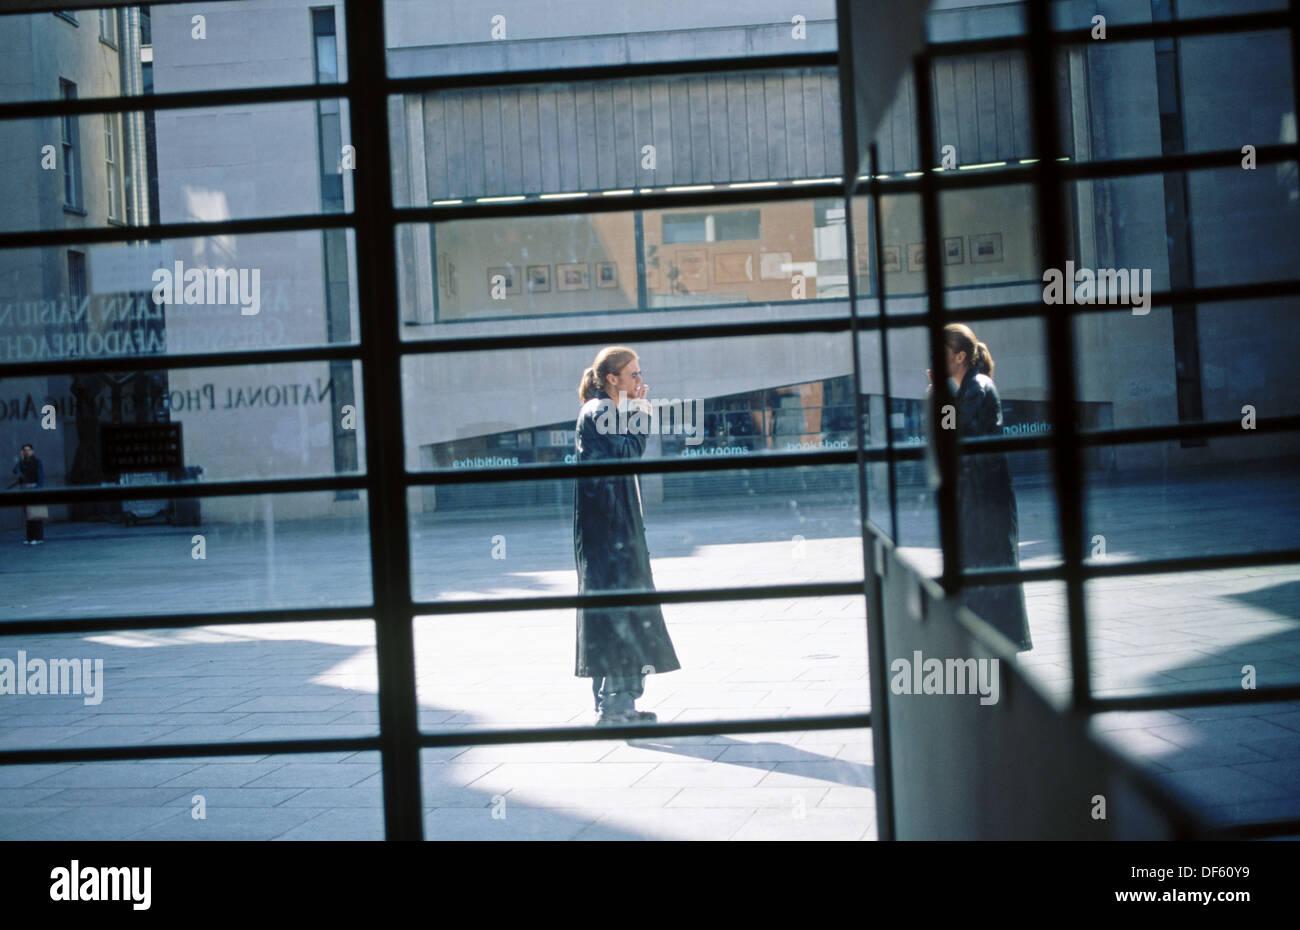 National Photographic Archive. Dublin. Ireland. - Stock Image